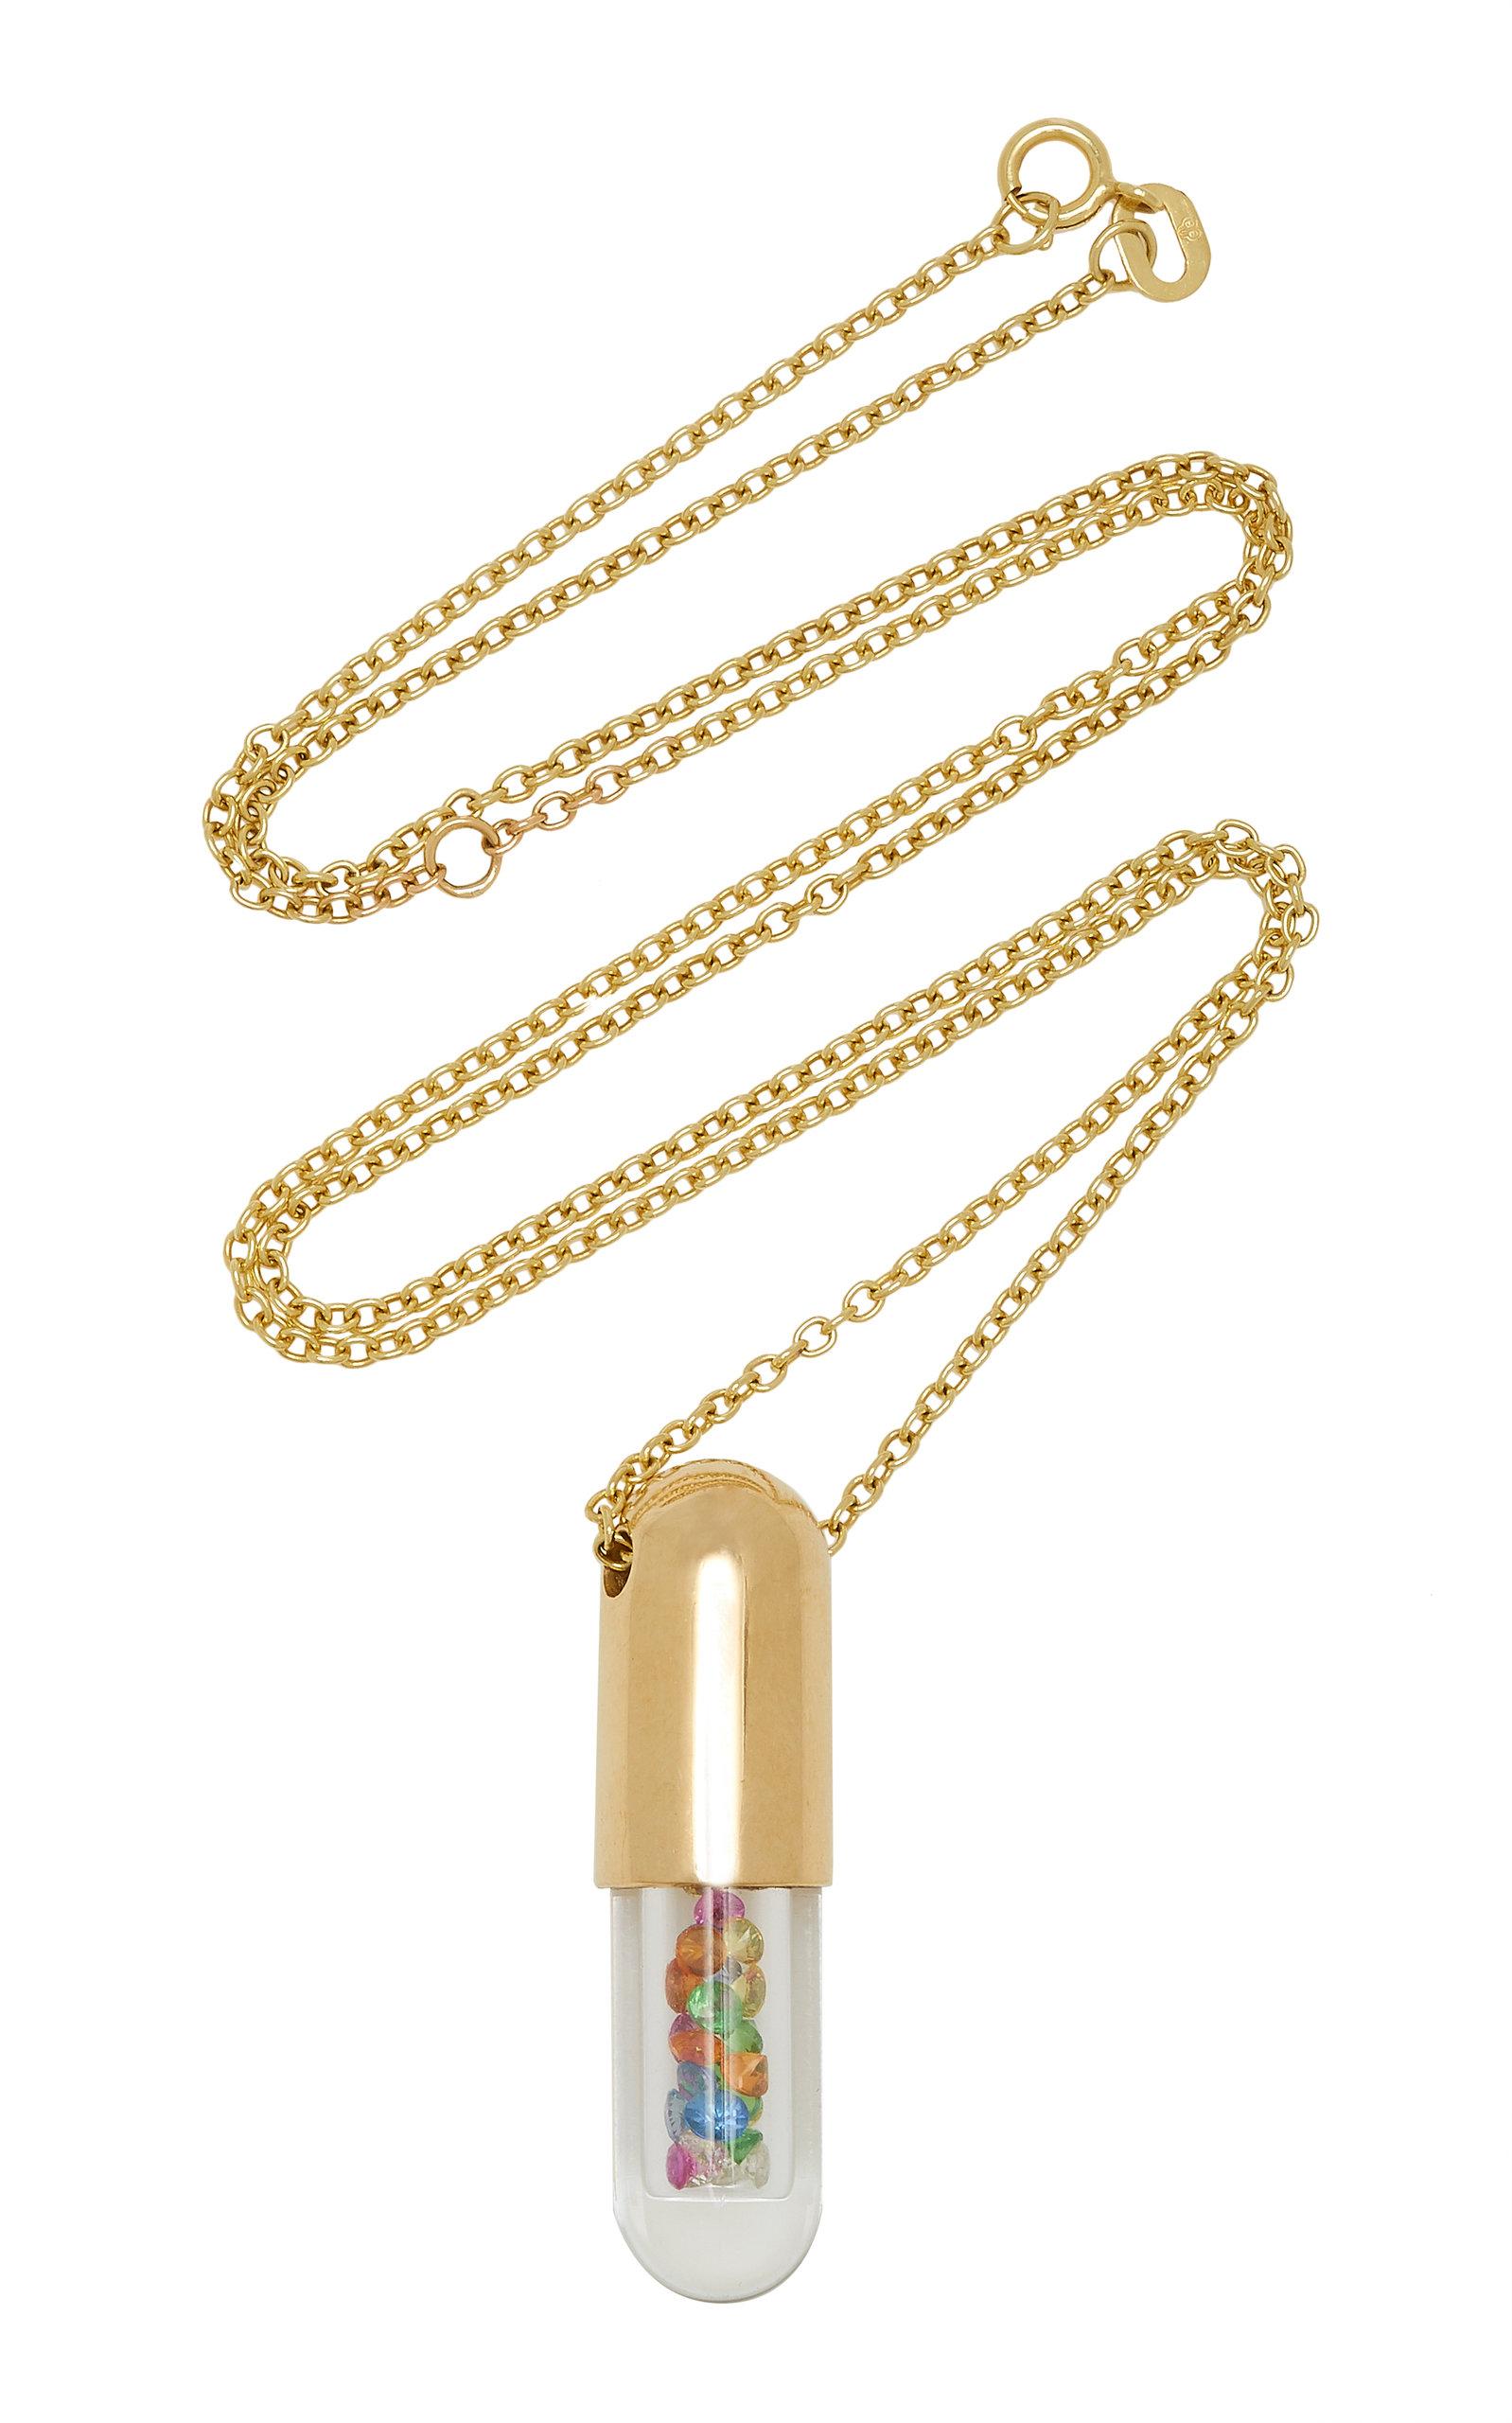 2c9ea474f Robinson Pelham9K Gold, Sapphire, Garnet, Tsavorite, And Diamond Necklace